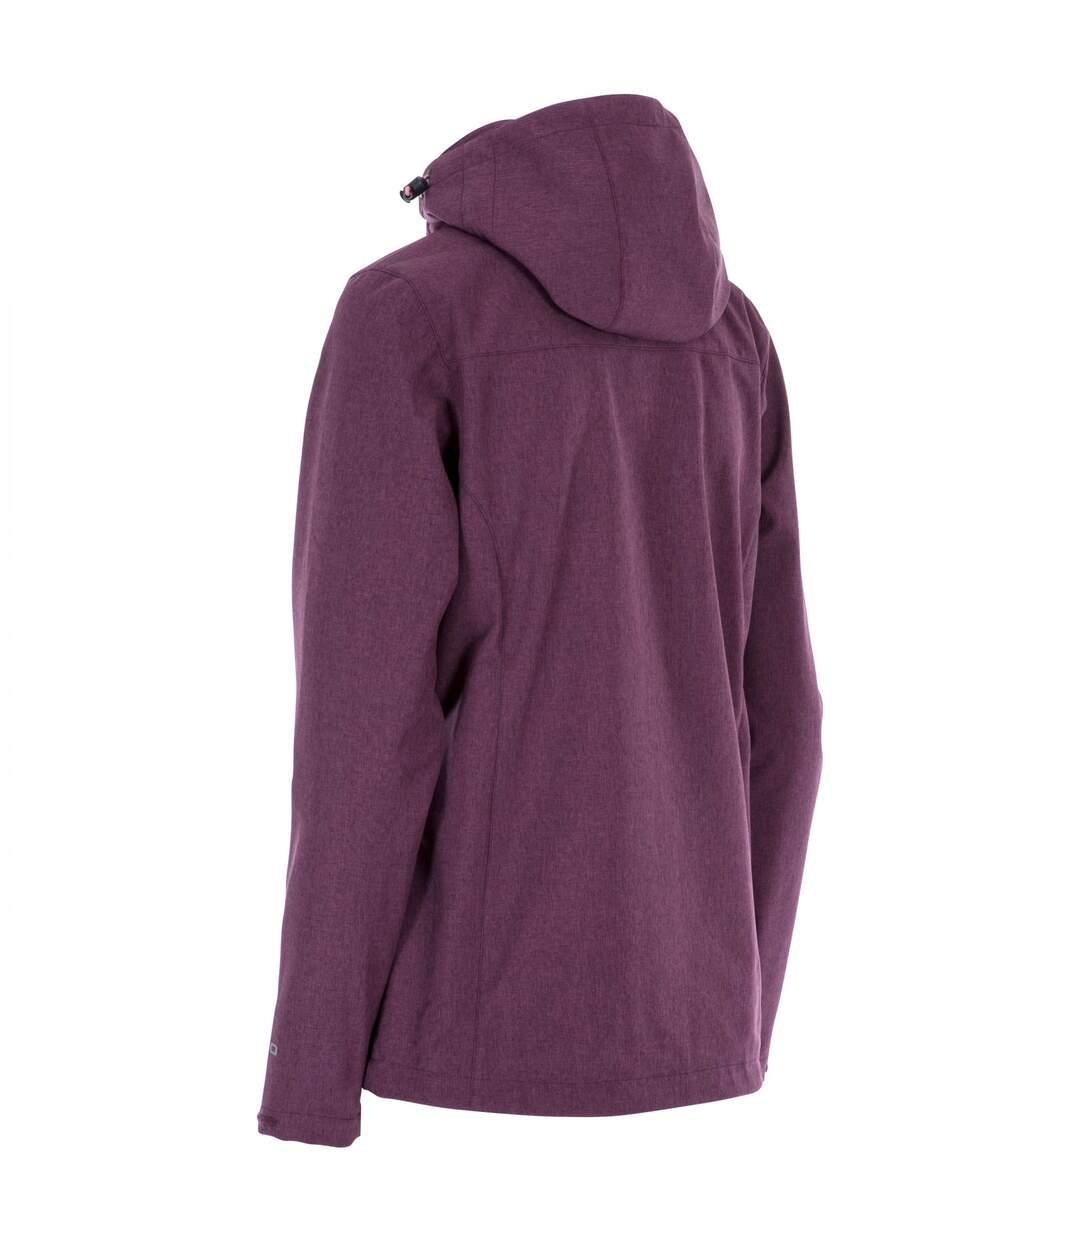 Trespass Womens/Ladies Claren II Waterproof Softshell Jacket (Fig Marl) - UTTP4615